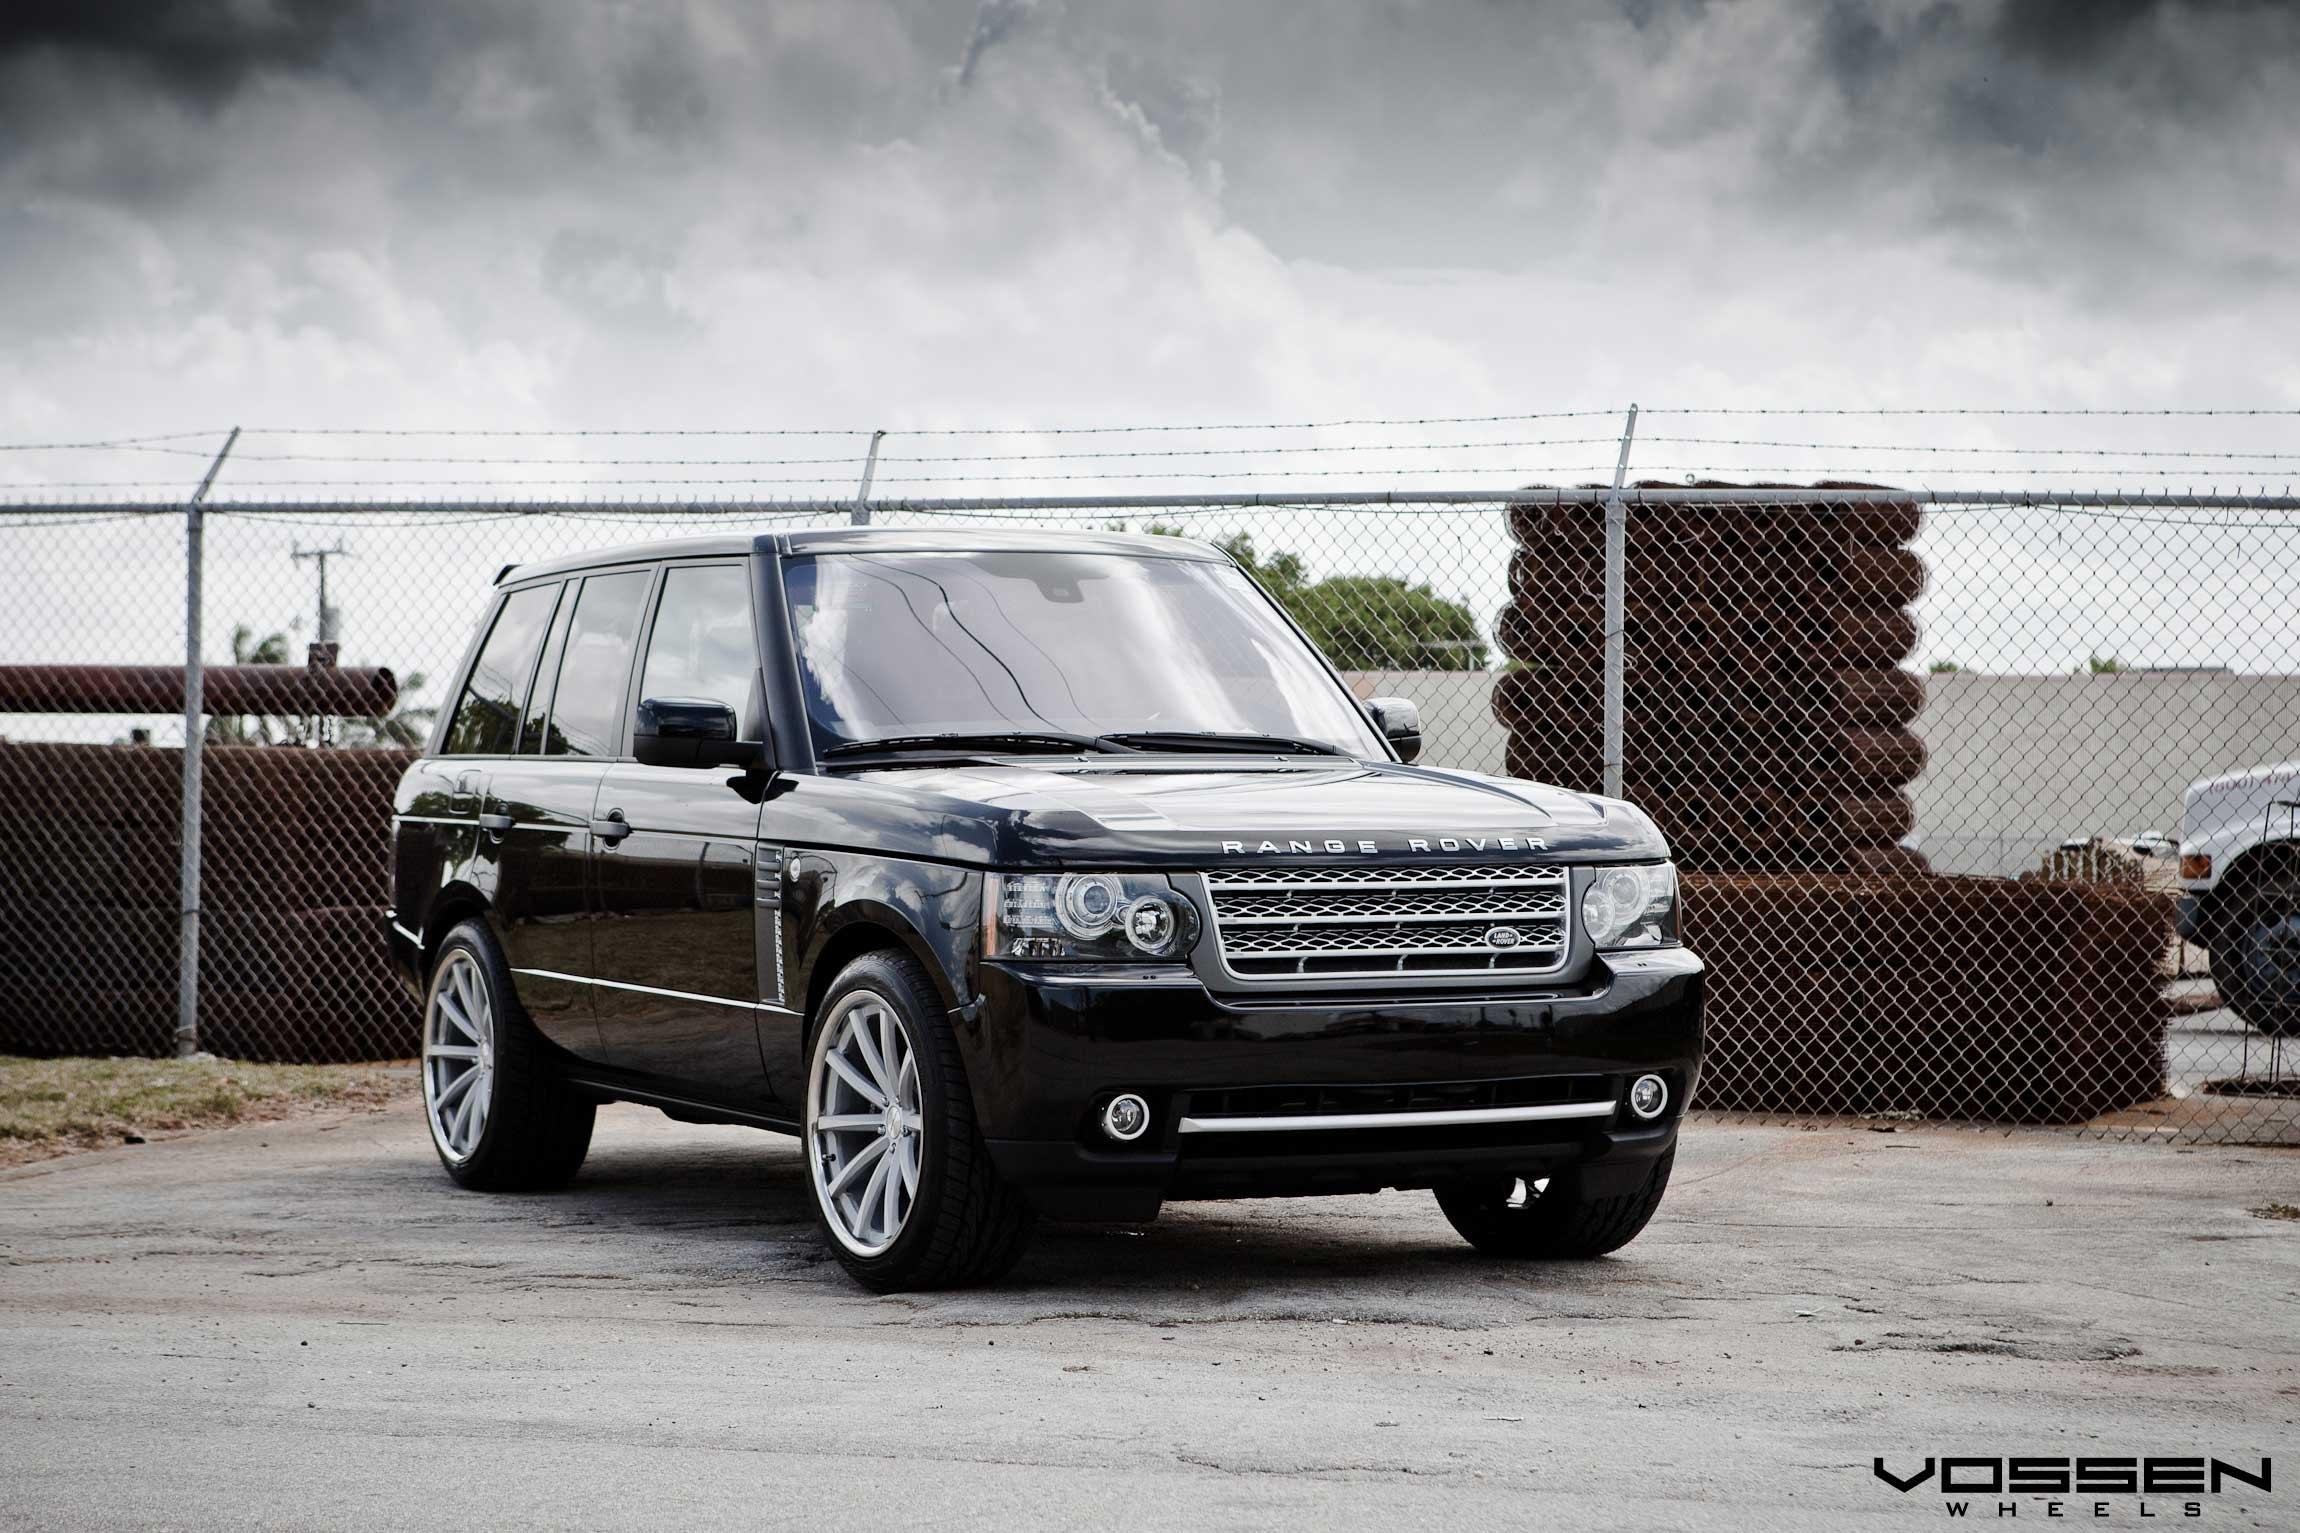 Prestige Ride Black Range Rover Enhanced With Custom Vossen Rims